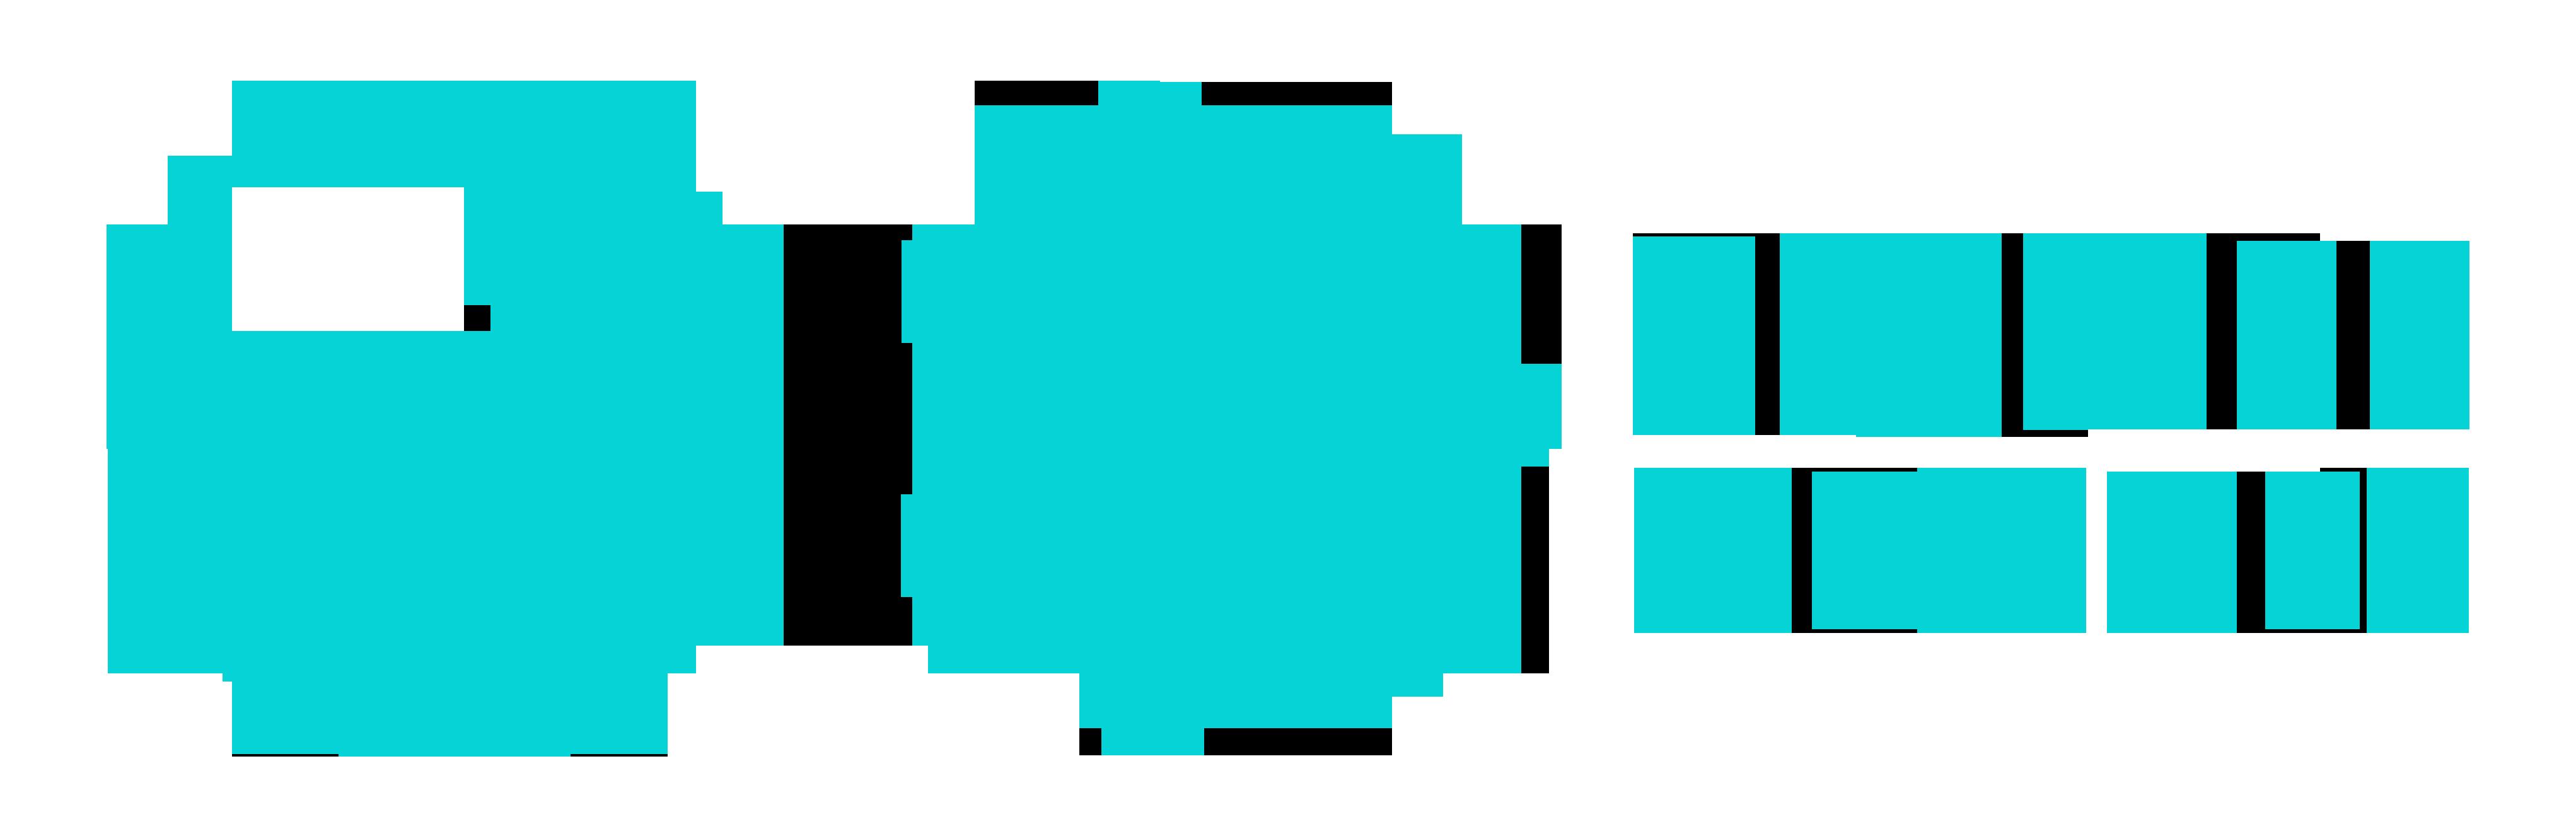 CCF-small-groups-logos-teal